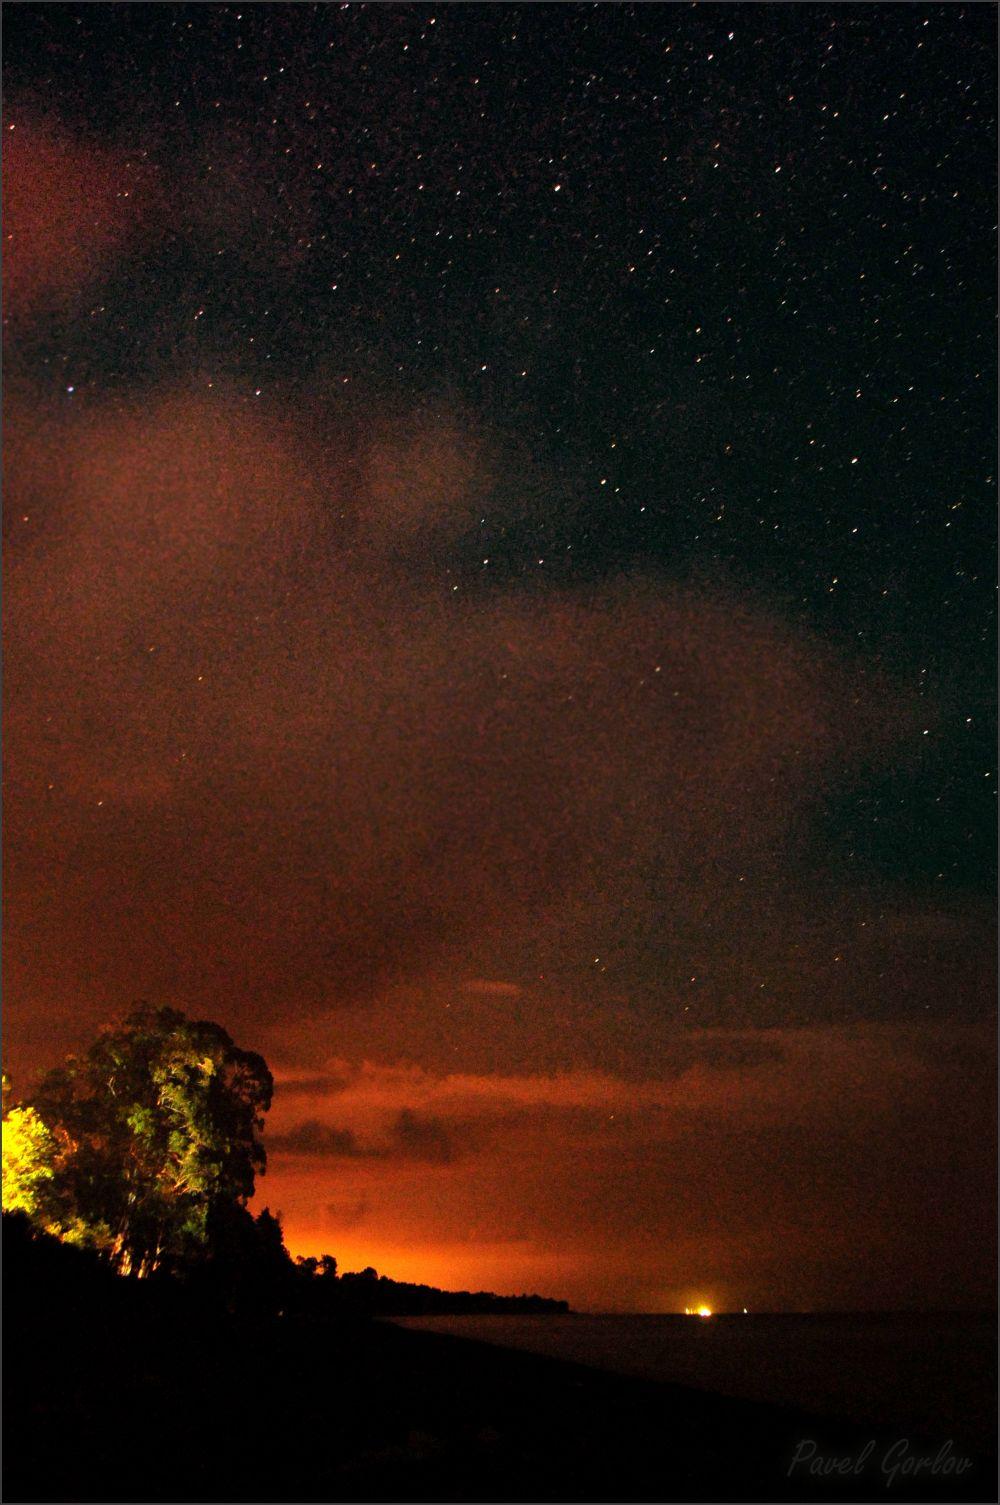 Зарево засветки от г.Очамчира и звёздное небо над ним.